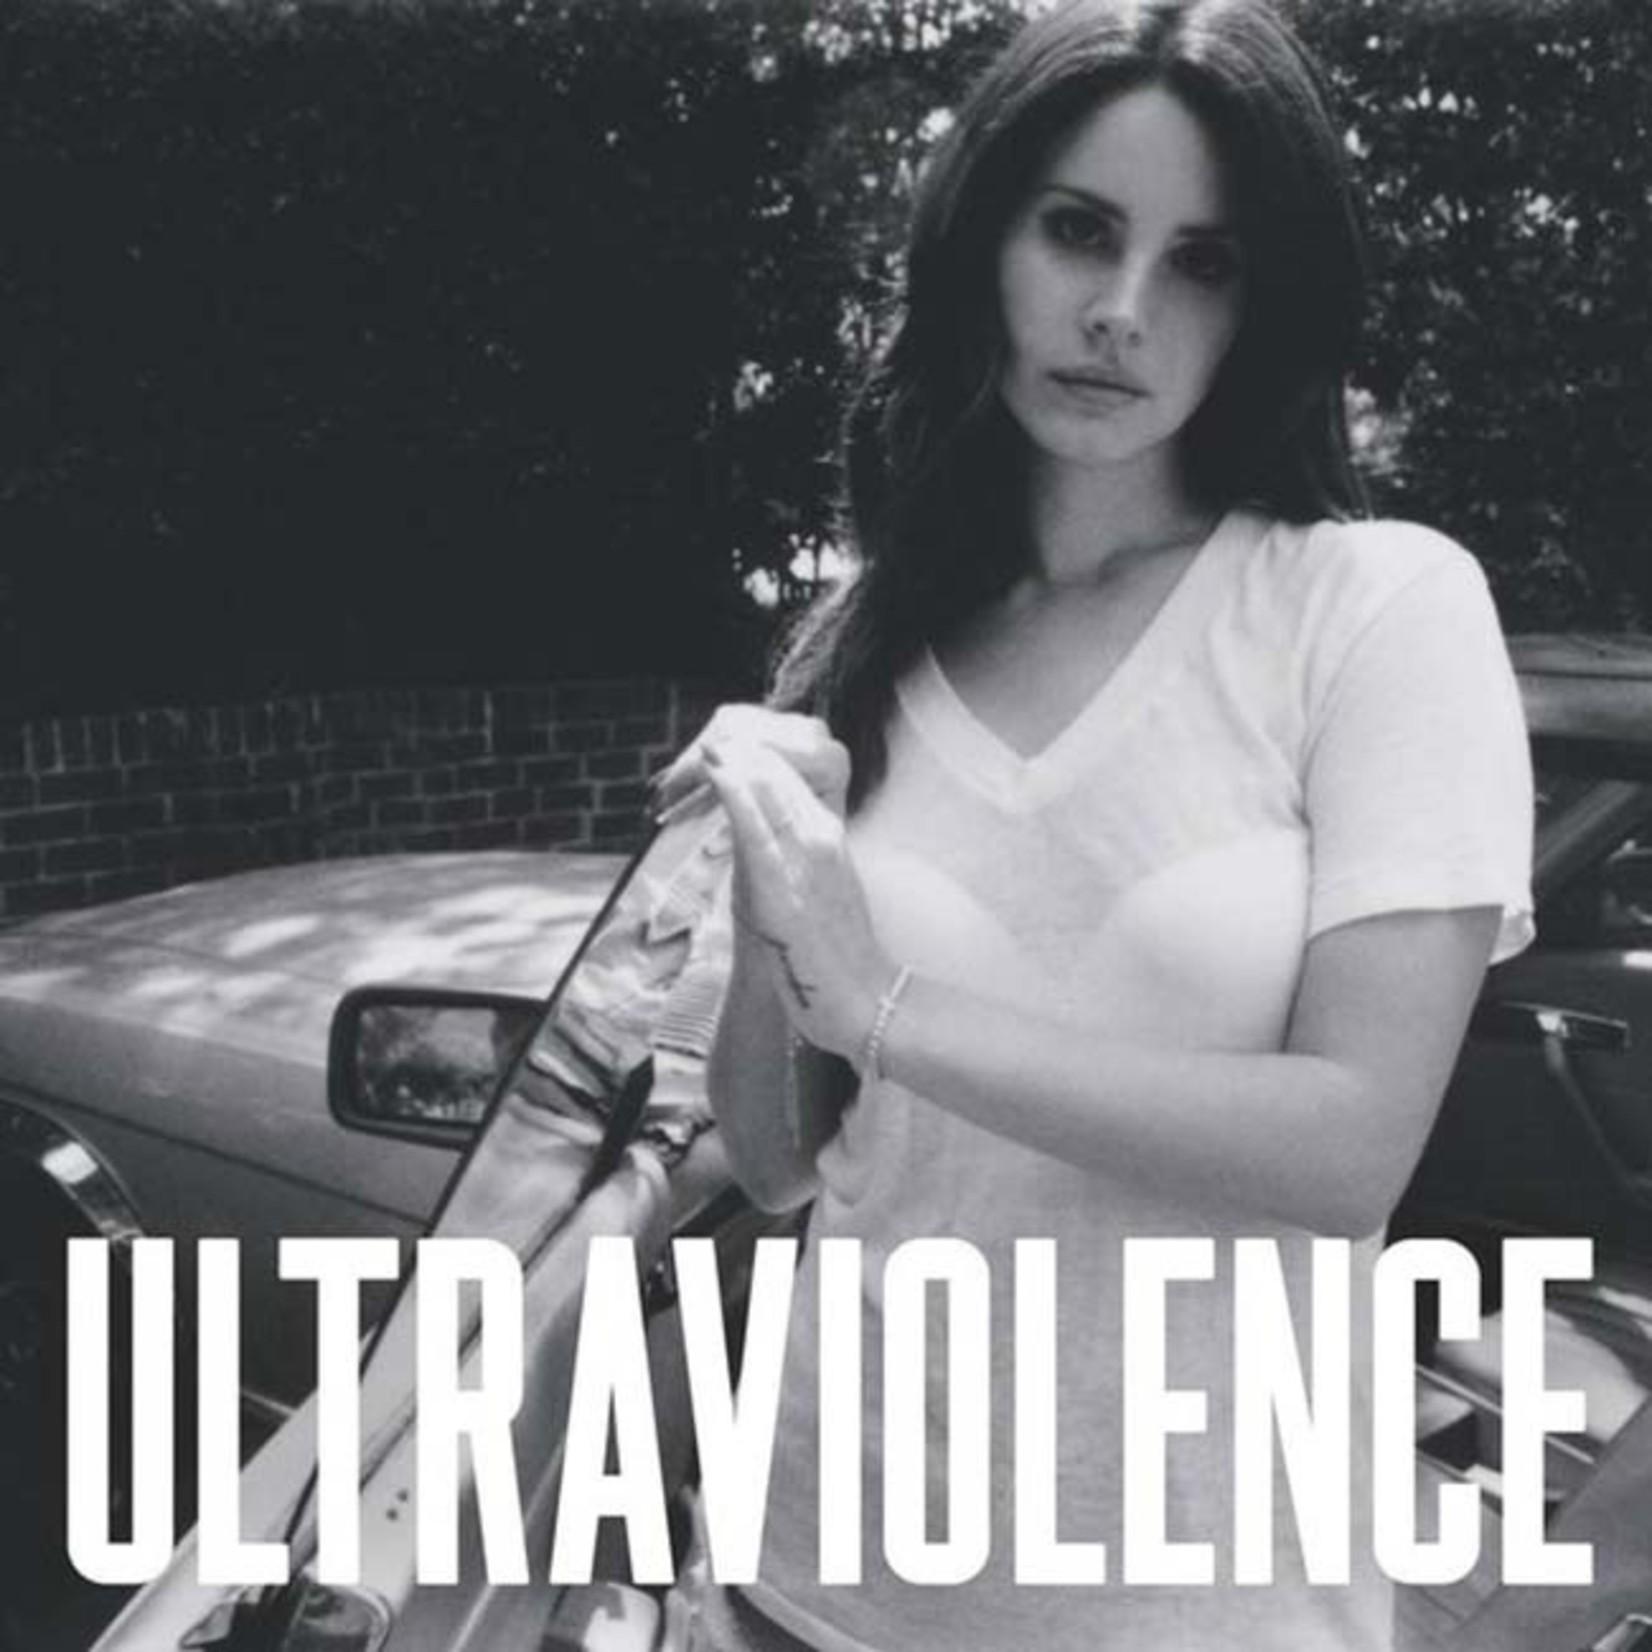 [New] Del Rey, Lana: Ultraviolence (2LP)